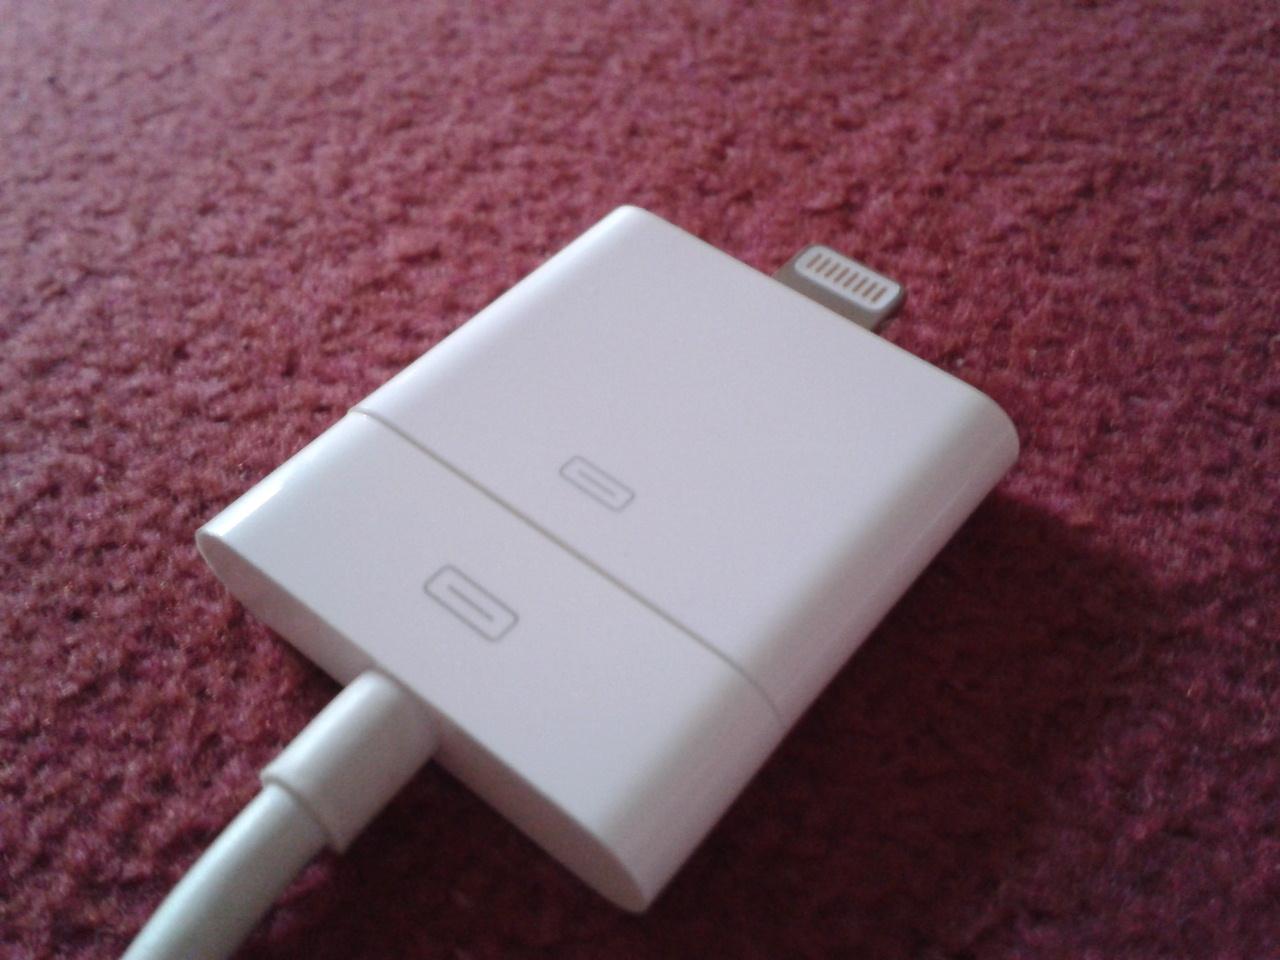 Apple Lightning Adaptor on 30-pin connector